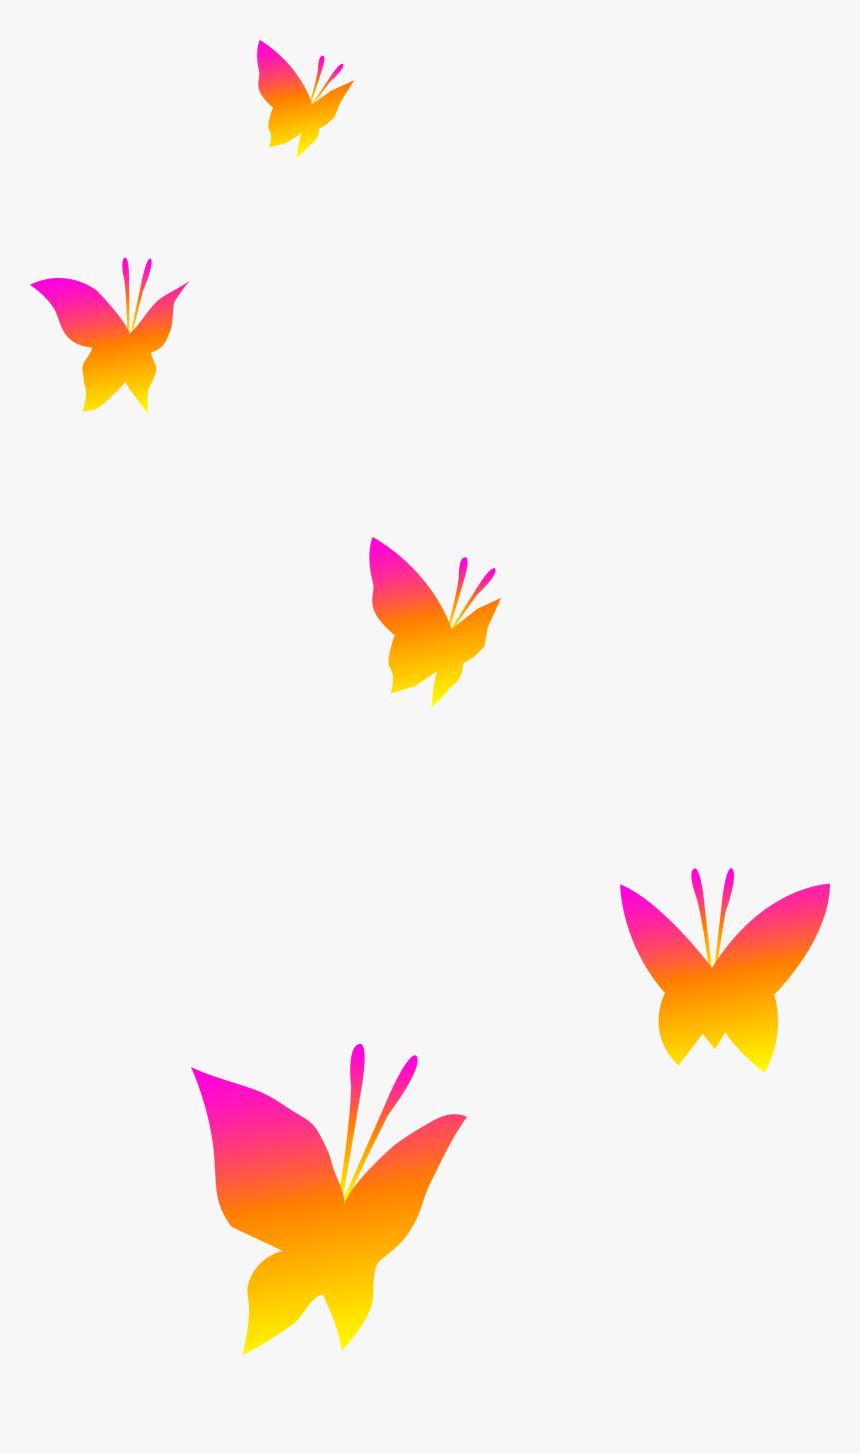 Butterfly Clip Art - Cartoon Butterflies No Background, HD Png Download, Free Download